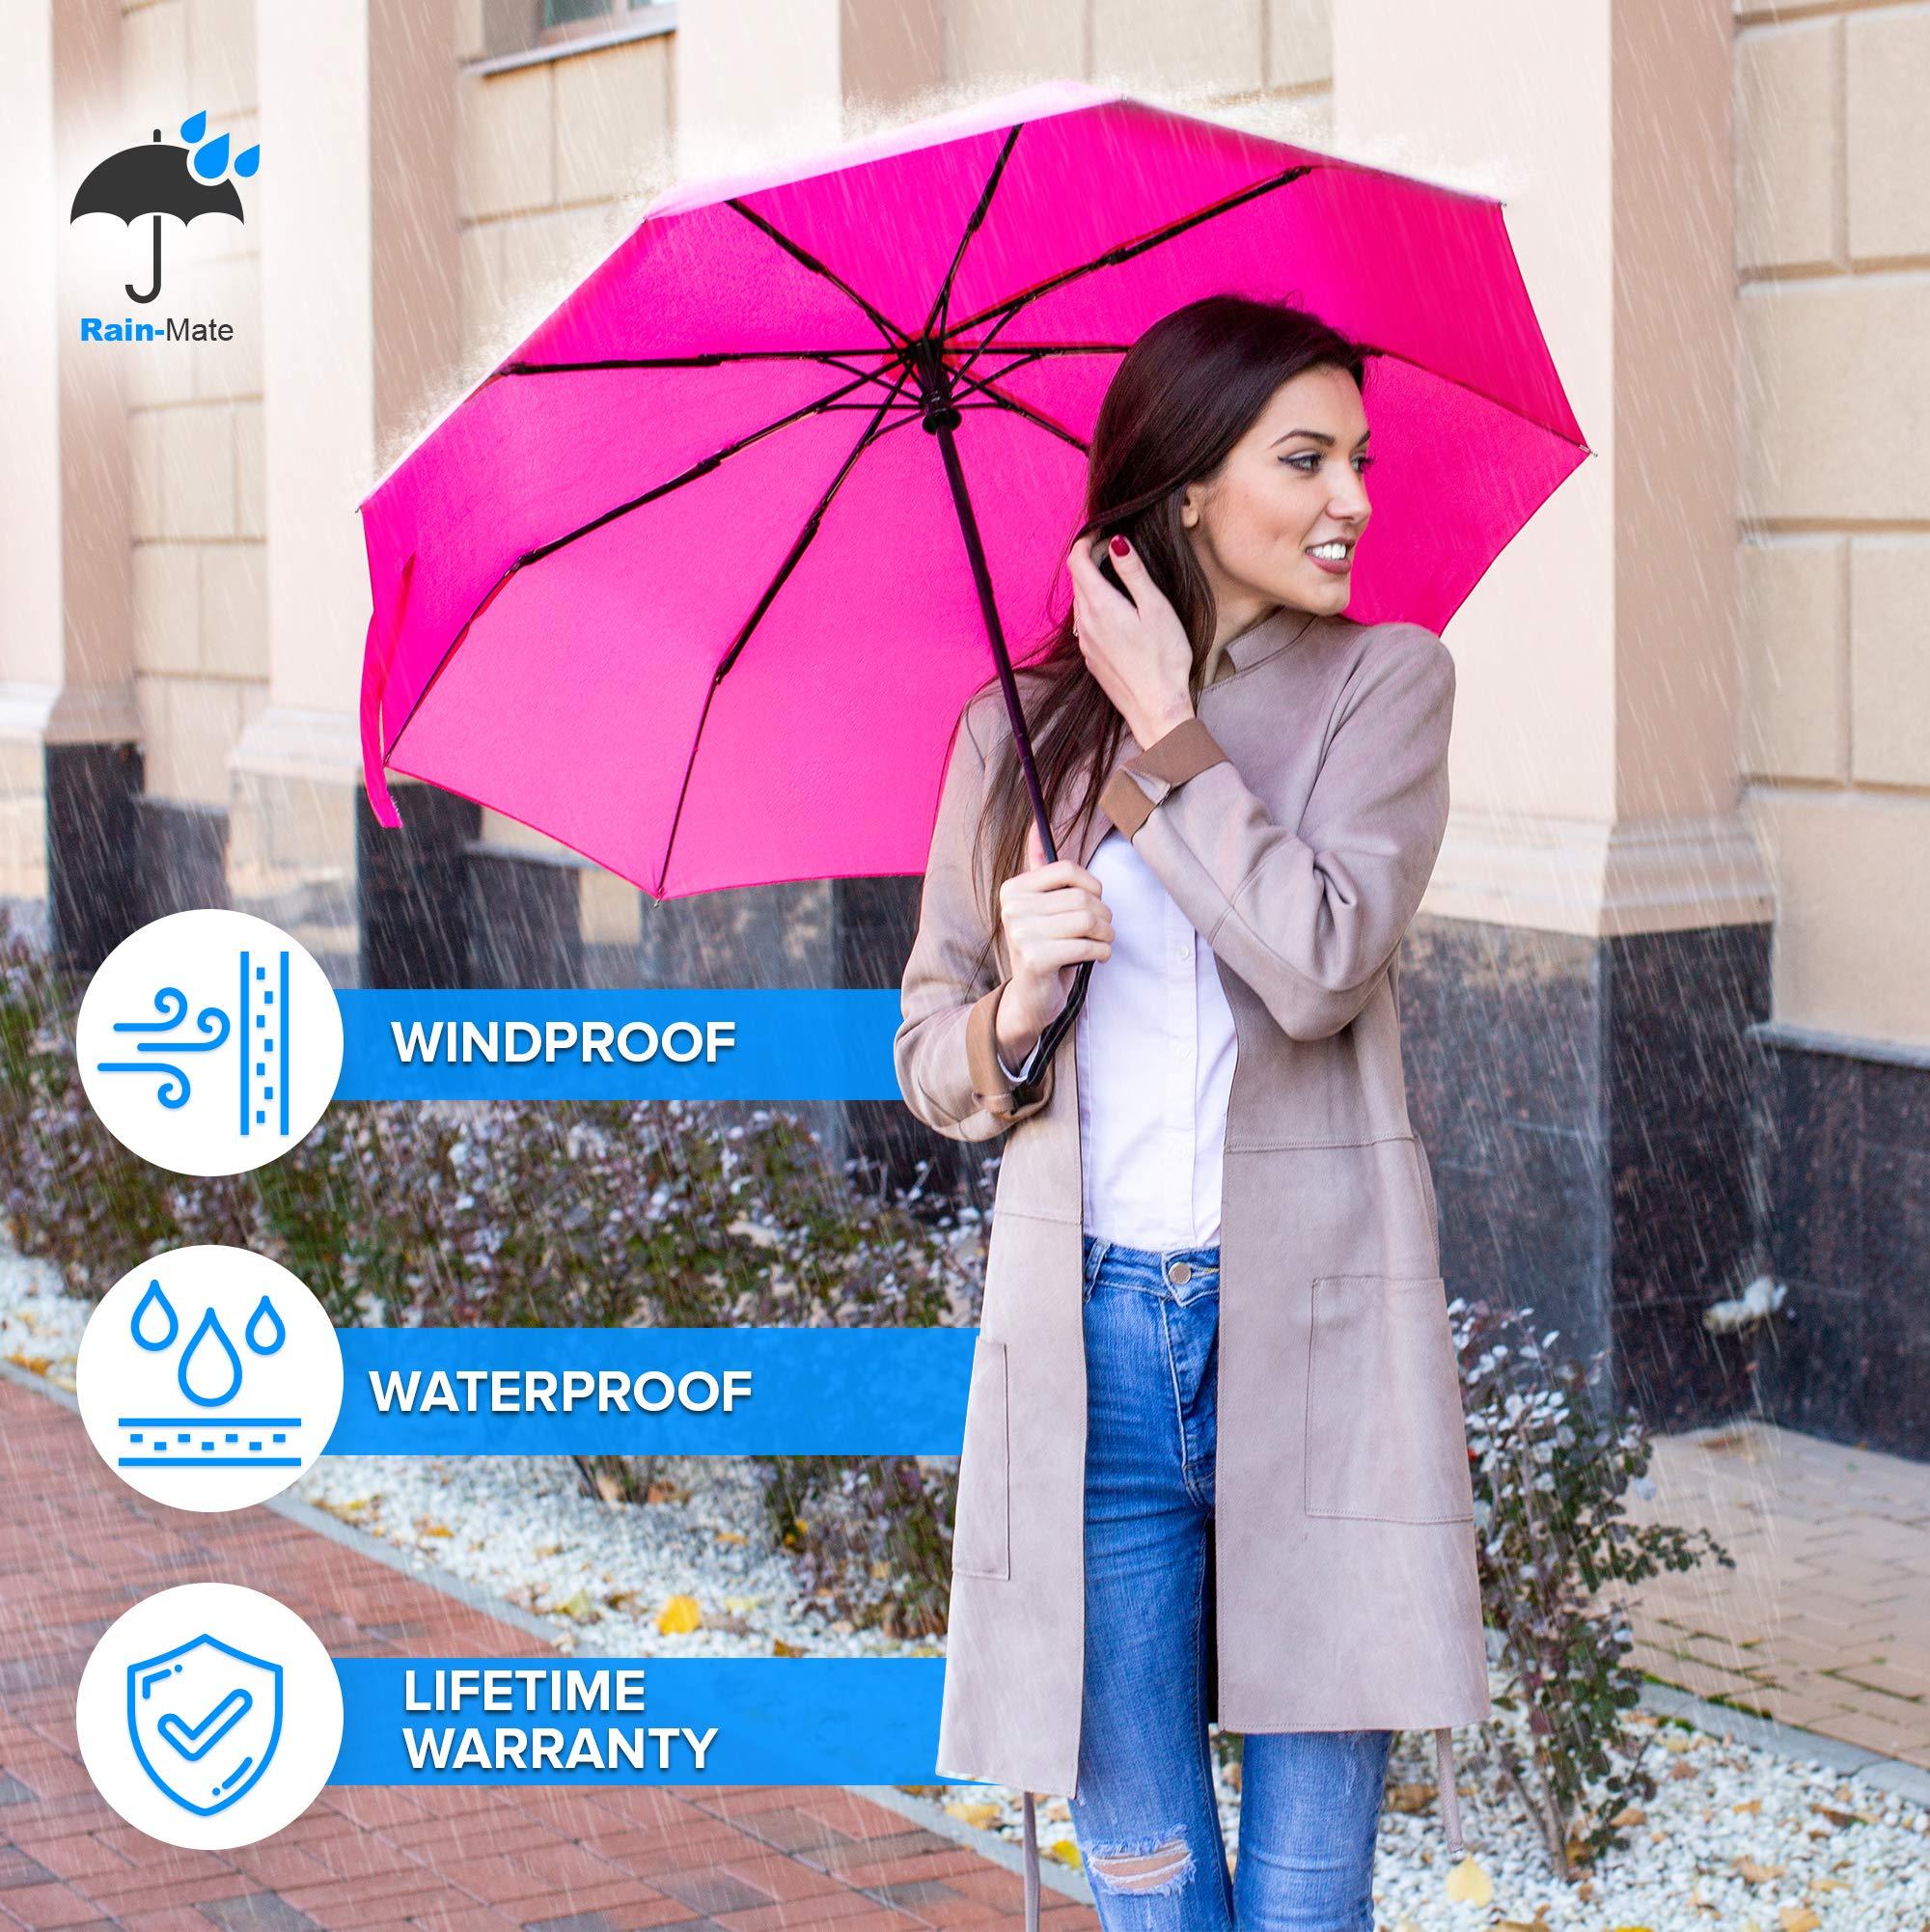 aa587a391d06 Rain-Mate Compact Travel Umbrella - Windproof, Reinforced Canopy ...